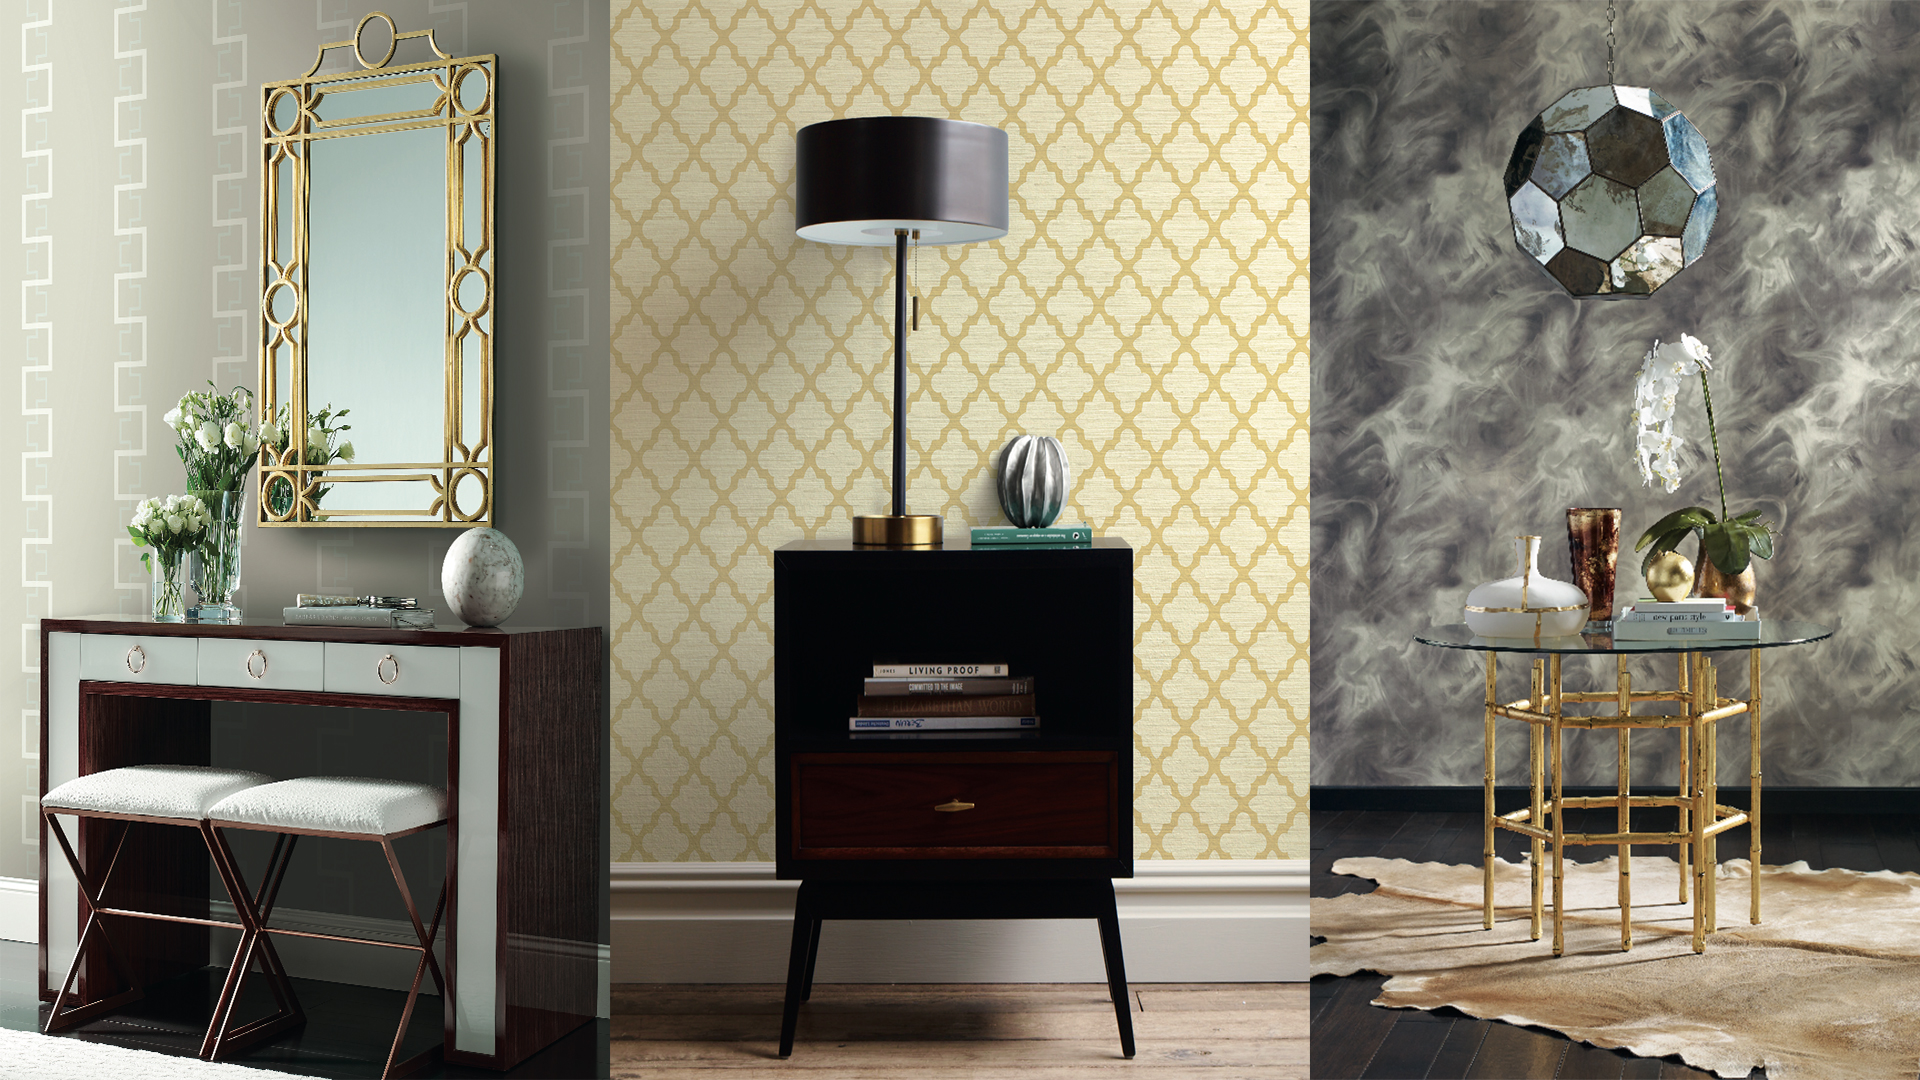 lidda-design-tucson-interior-designer-wallpaper-top-best-affordable-remodel-renovations.jpg